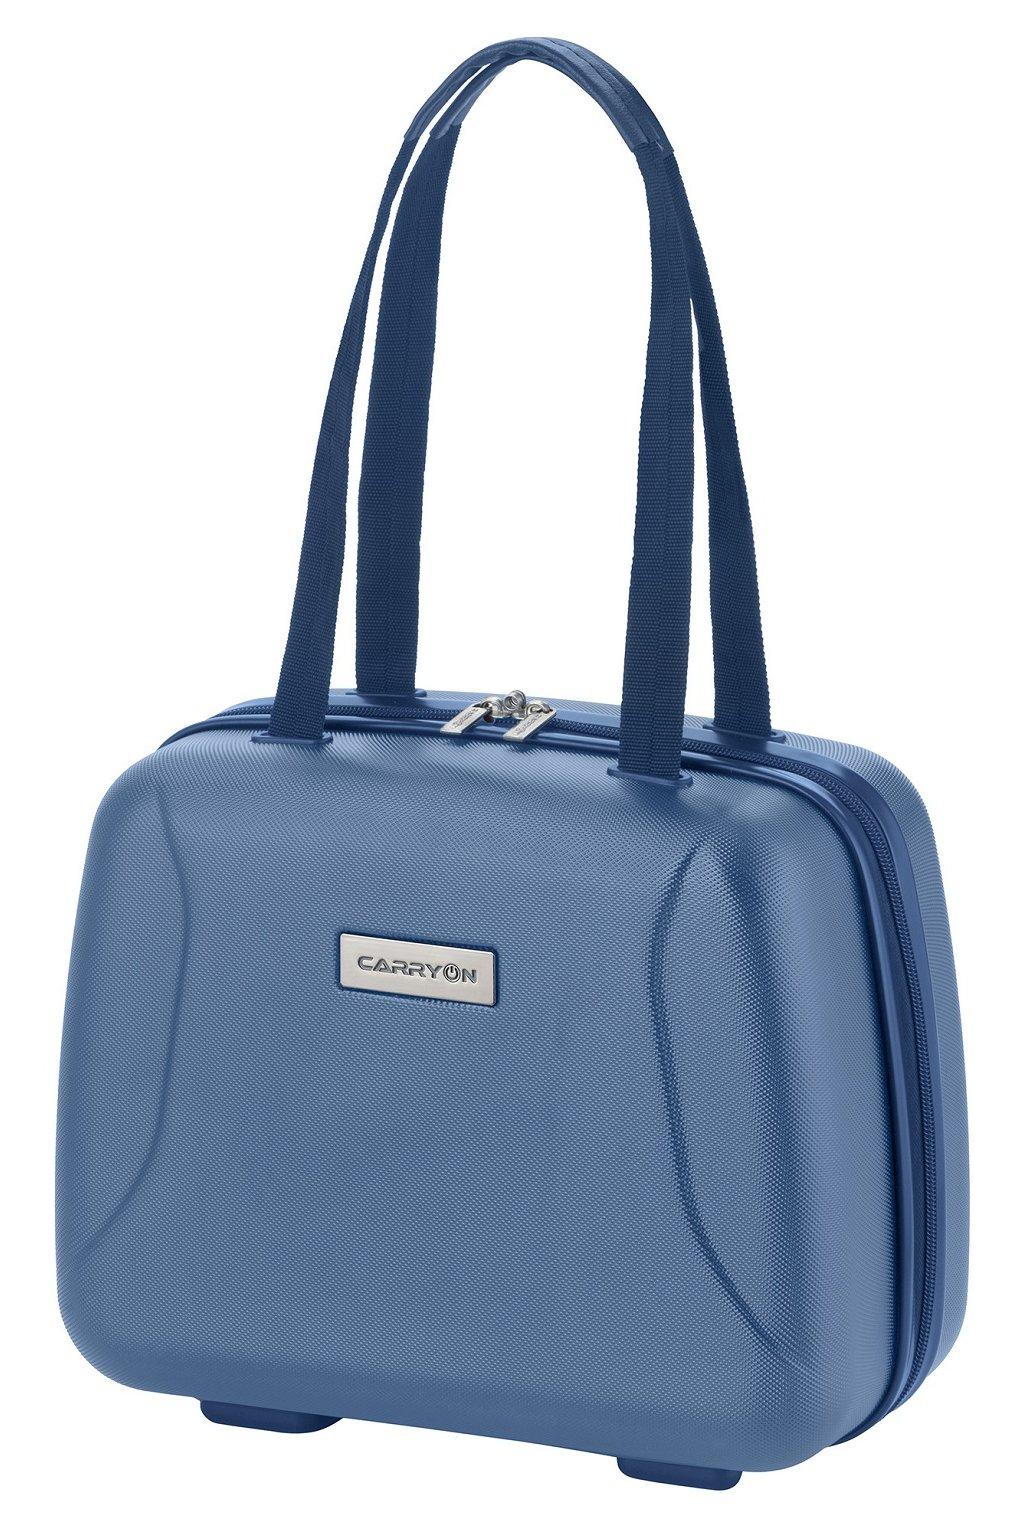 kufrland carryon skyhopper beautycase blue (12)